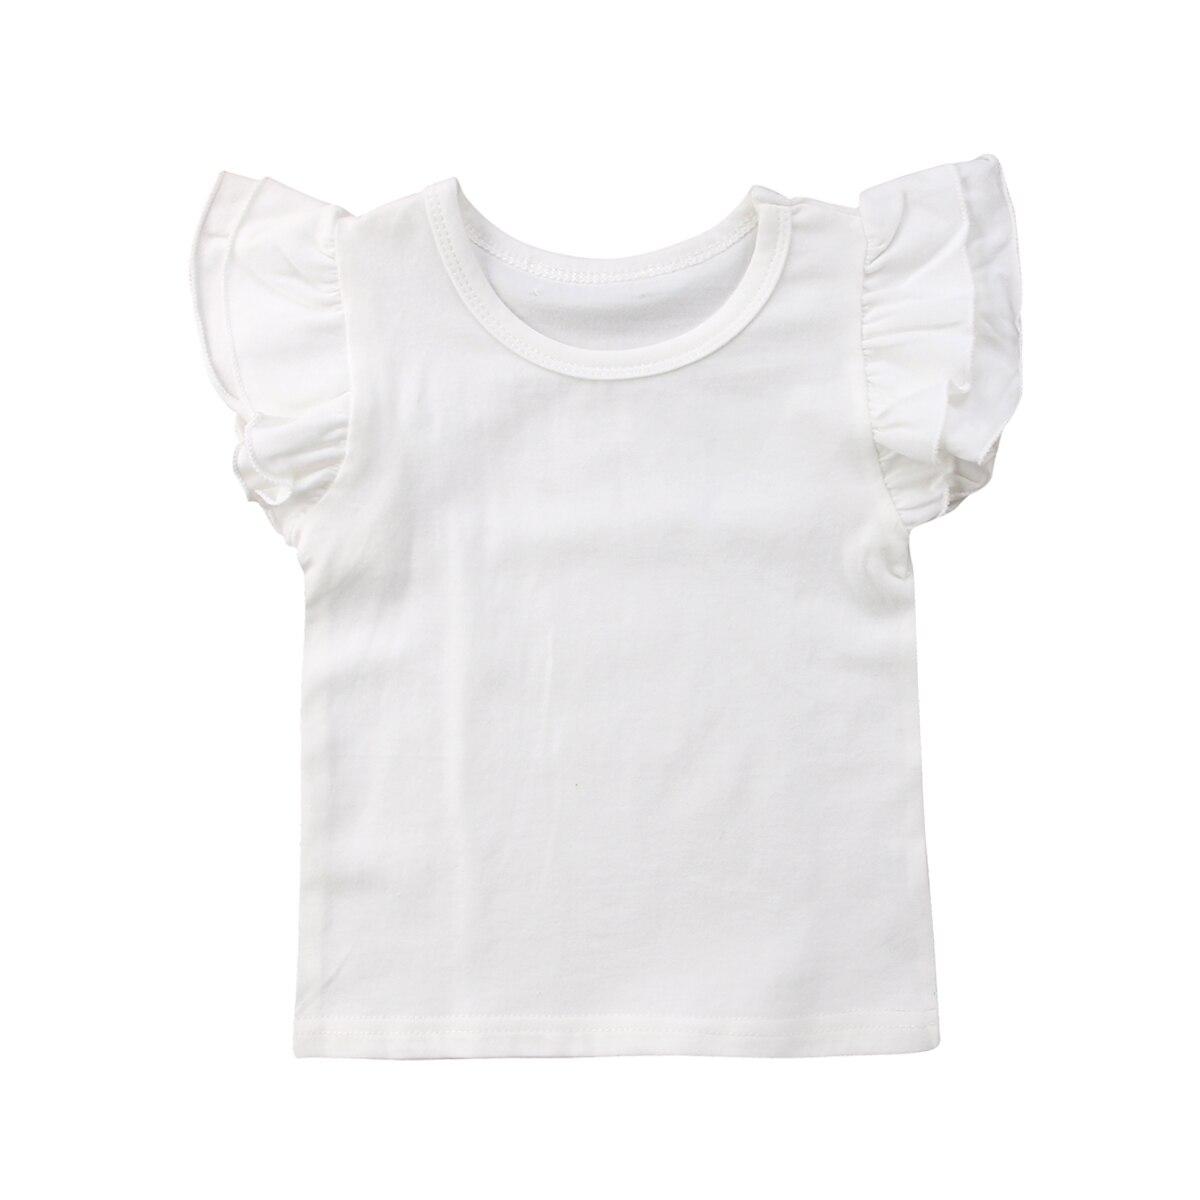 Toddler Baby Kids Girls Tops Basic Ruffle Fly Sleeve T-Shirt